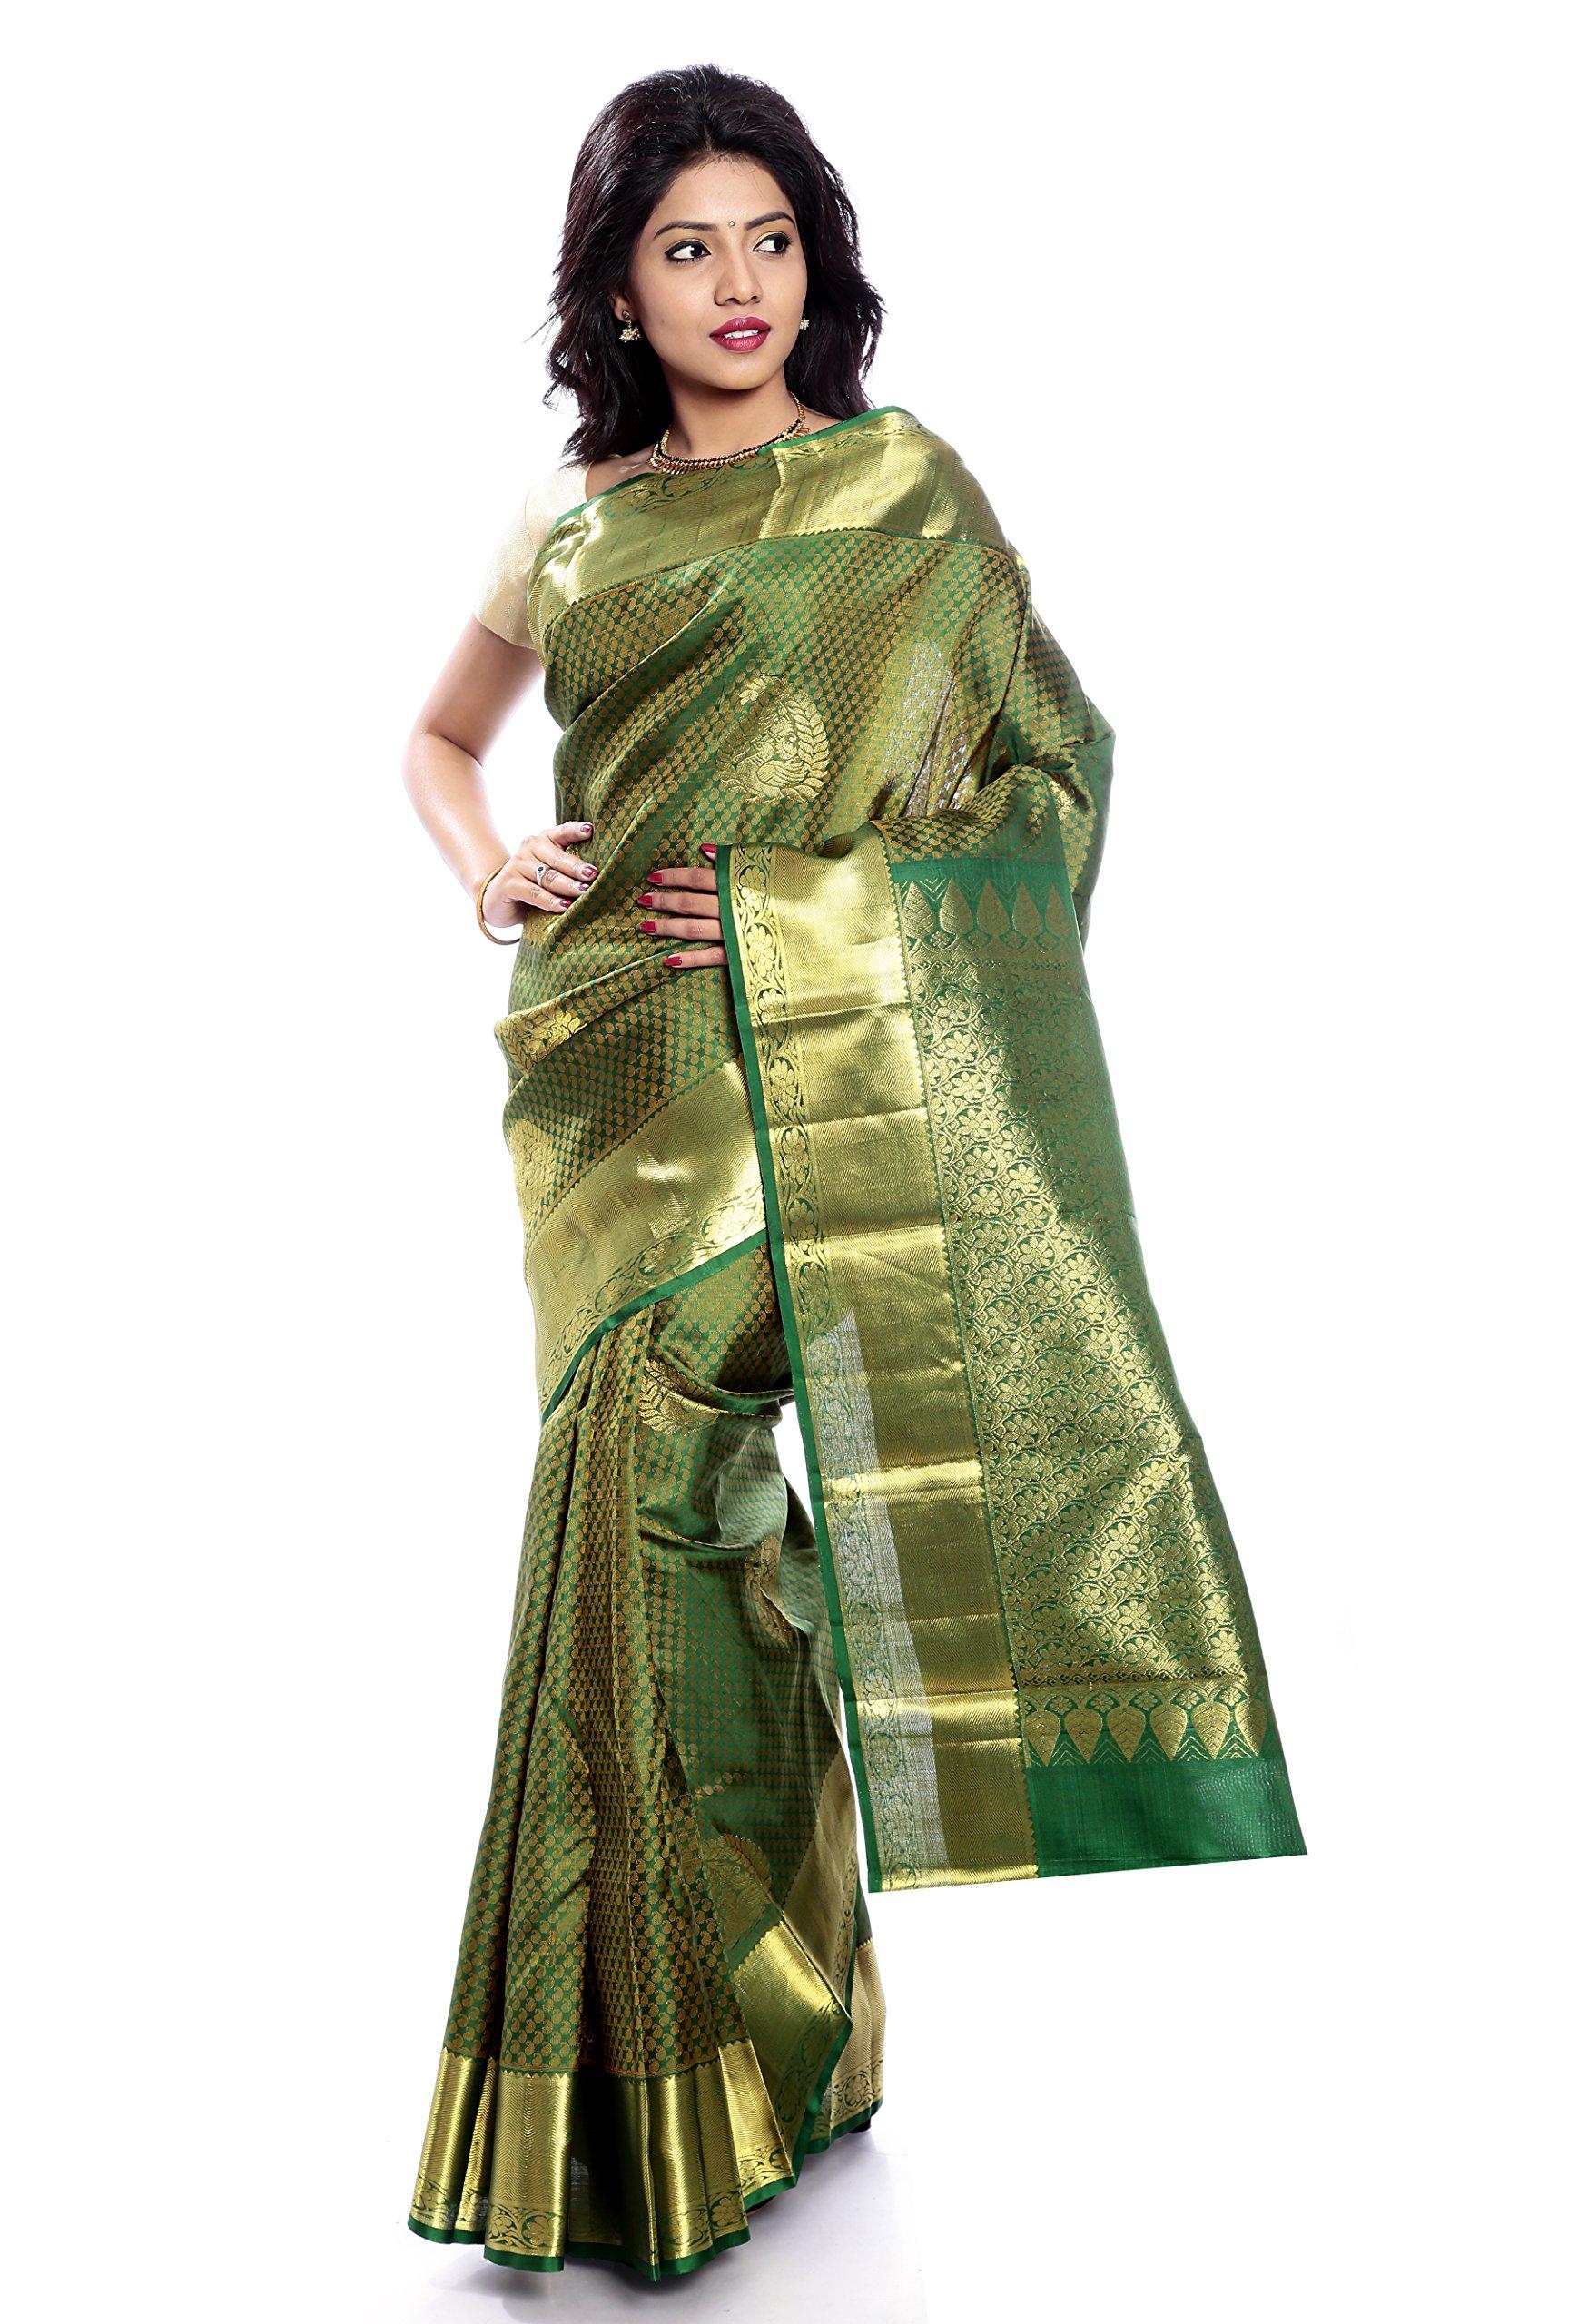 Mandakini — Indian Women's Kanchipuram - Handloom - Pure Silk Saree (Dark green ) (MK219)